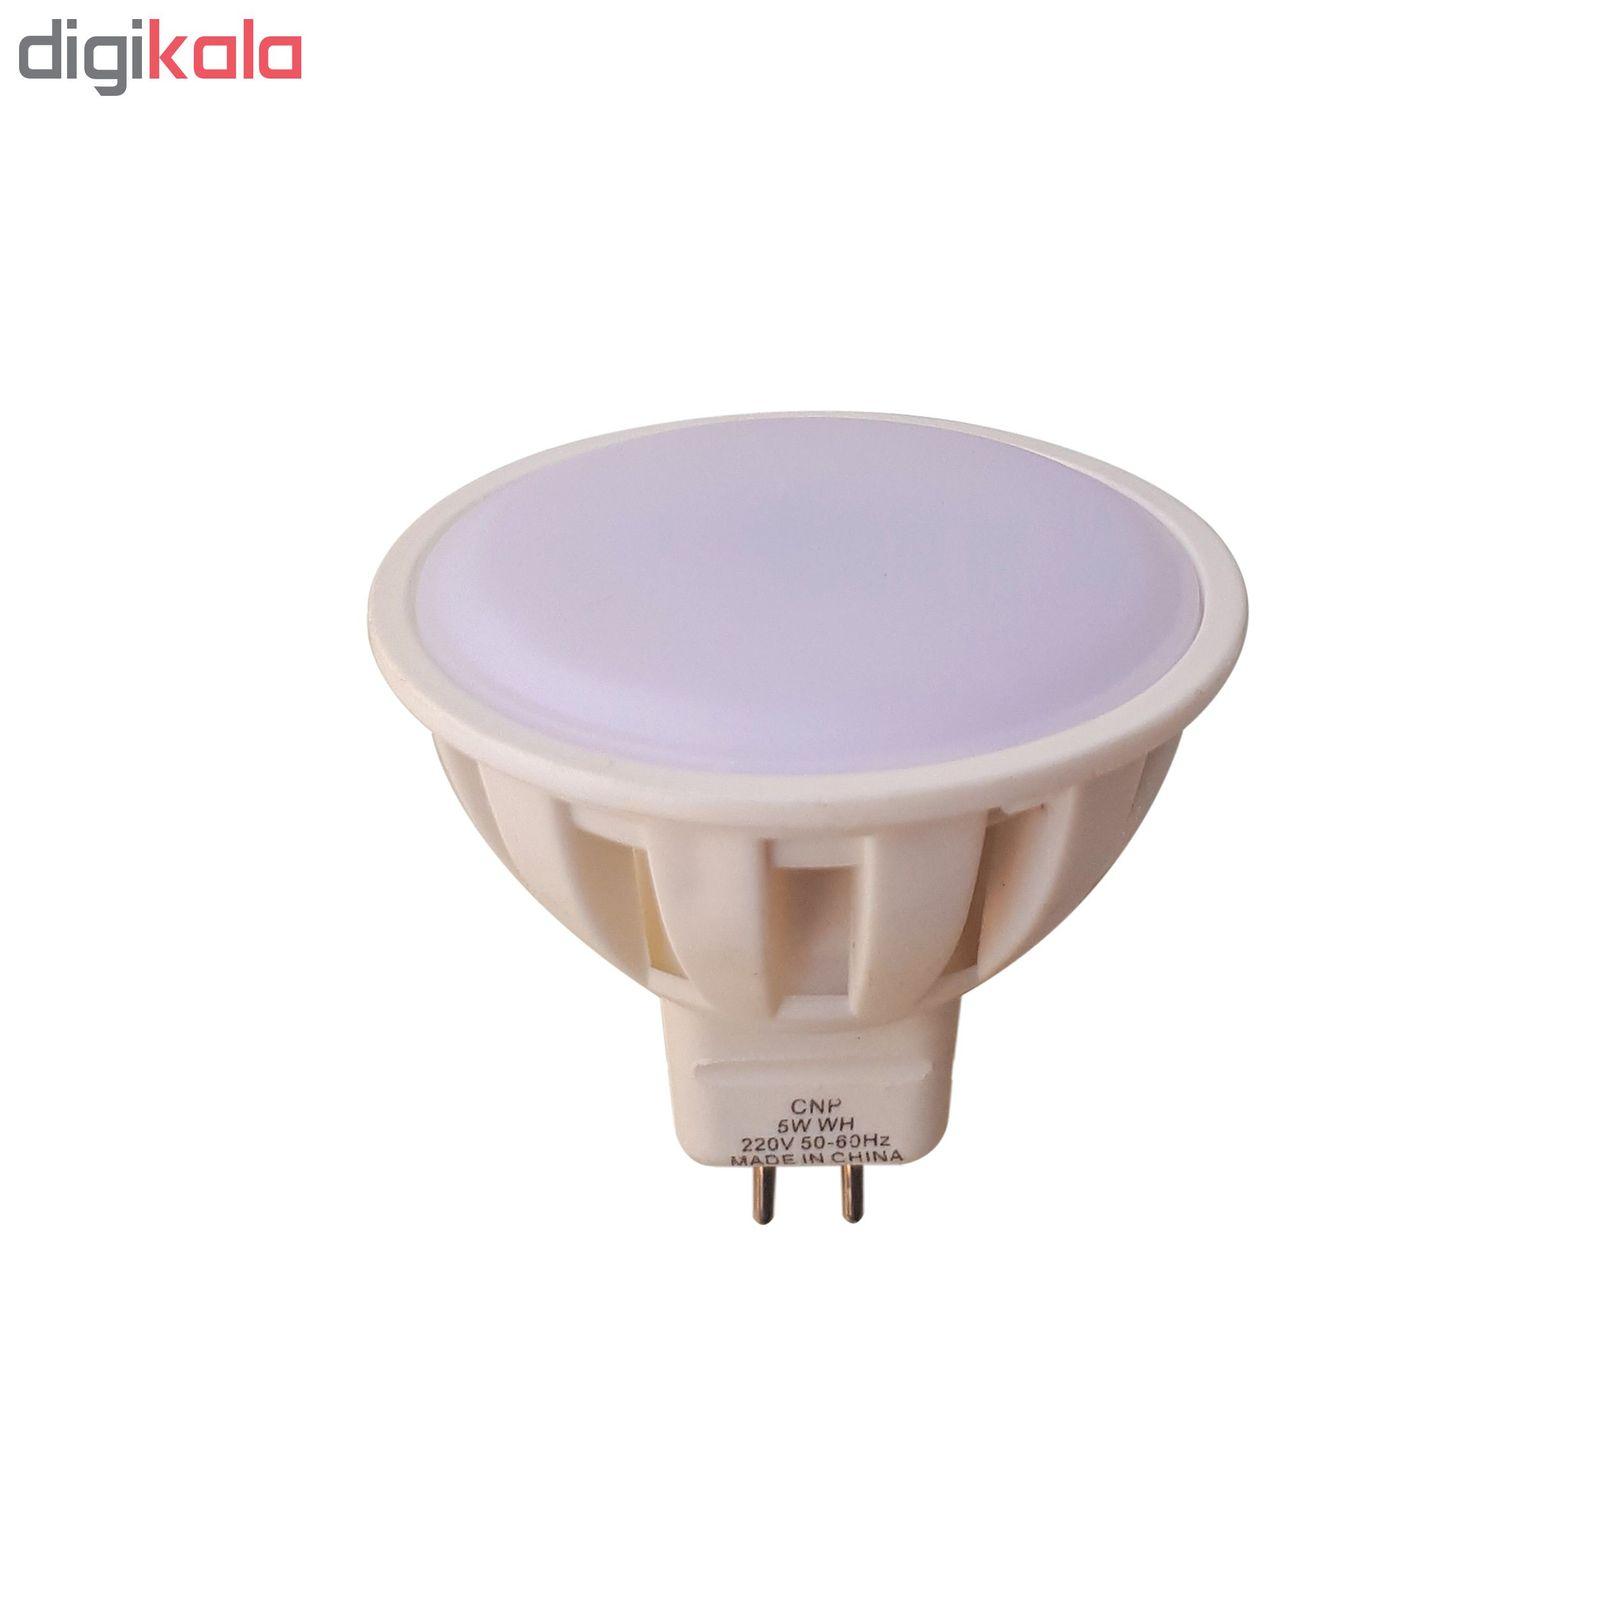 لامپ هالوژن ال ای دی 5 وات کد CNP پایه سوزنی  main 1 1